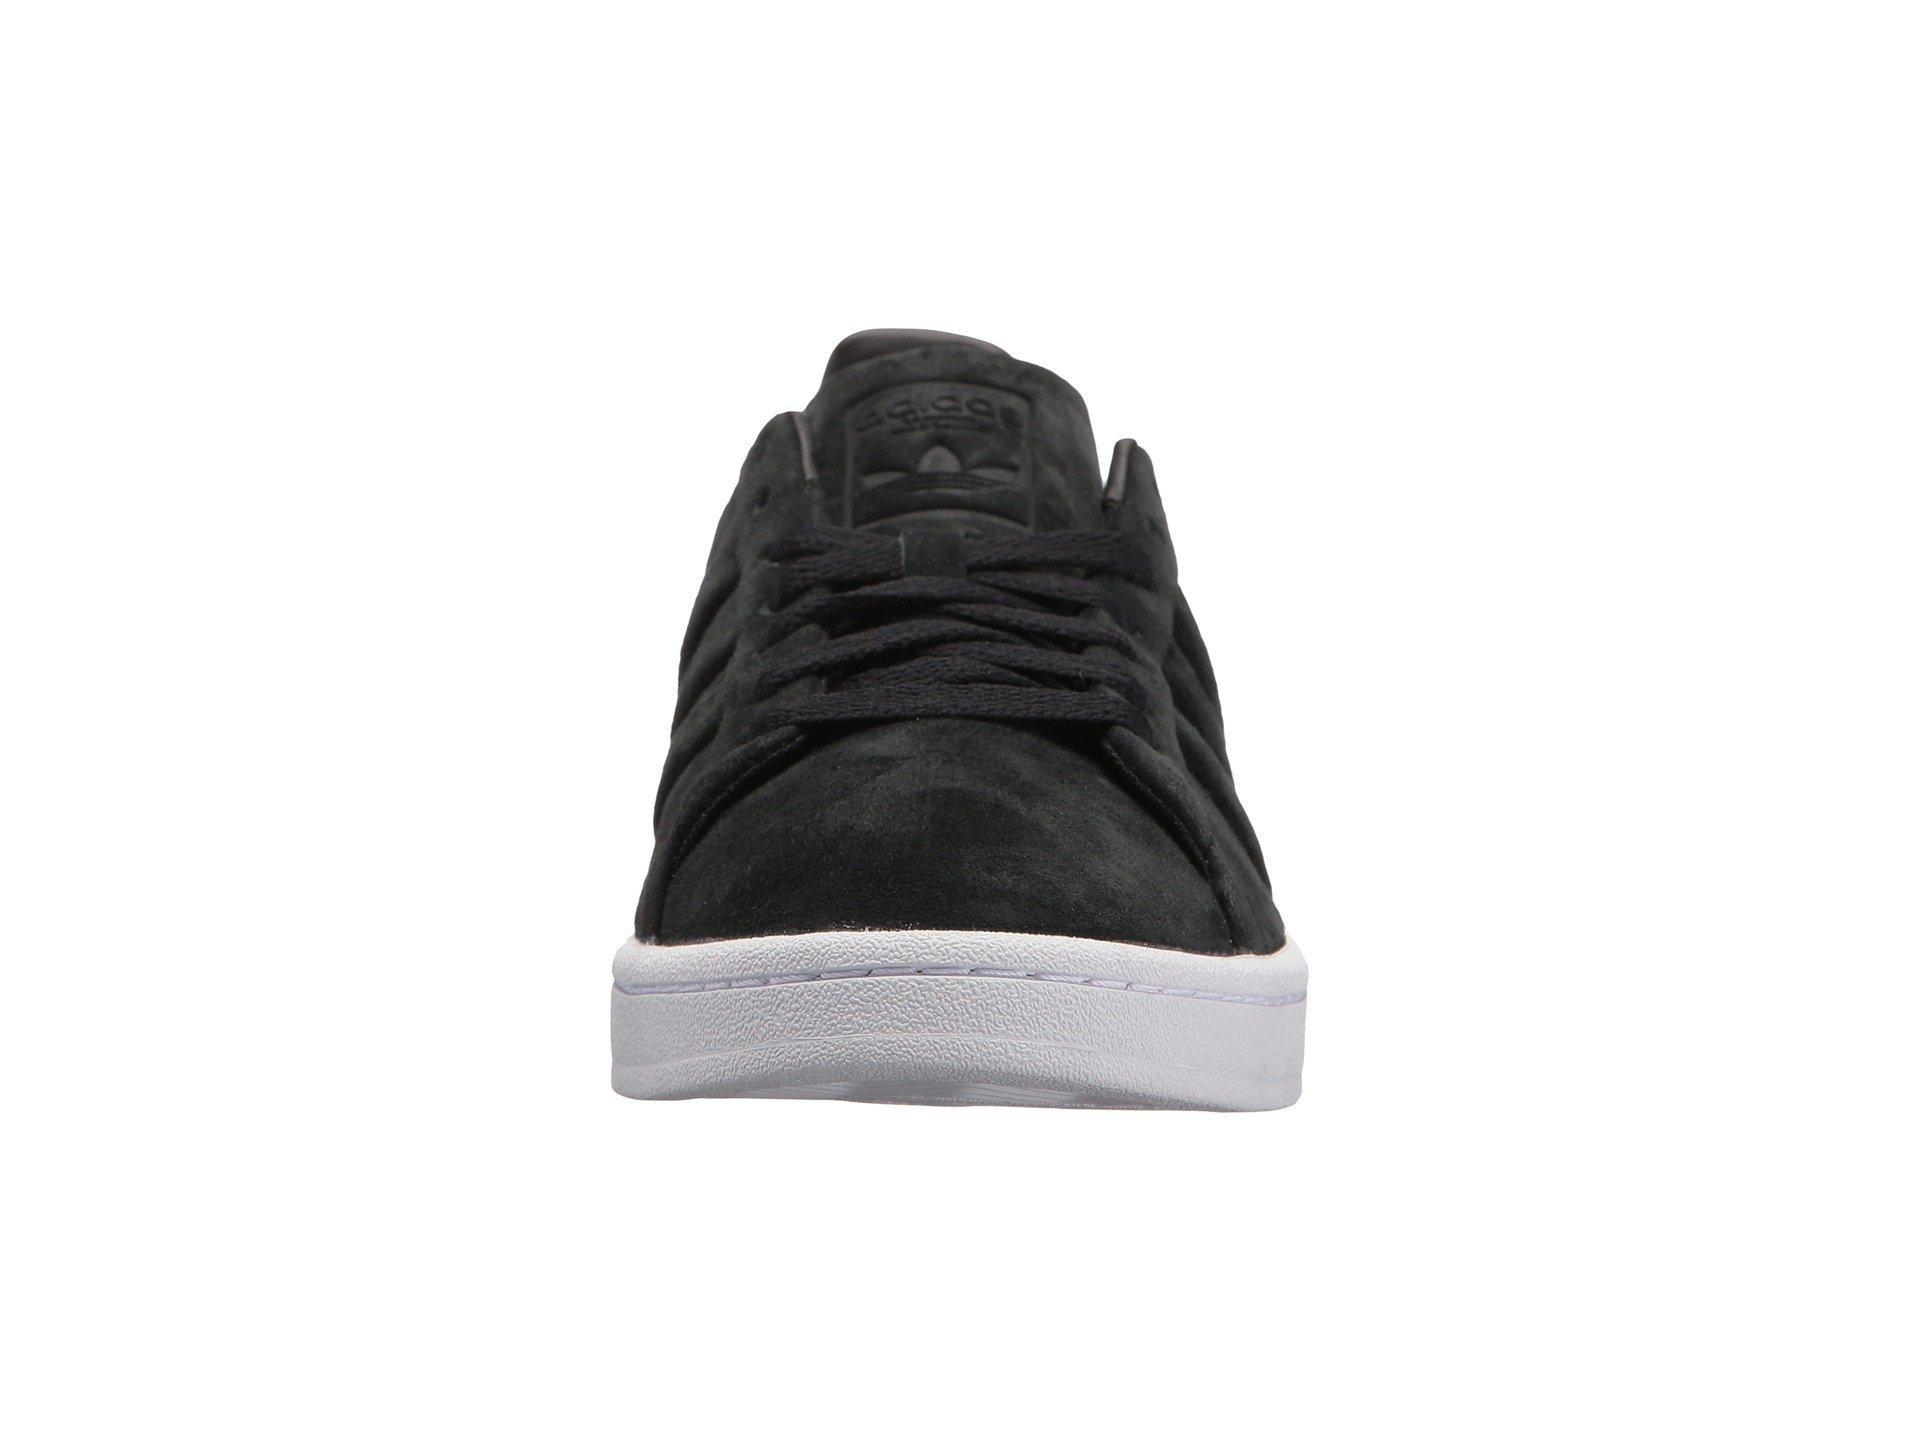 quality design d1b8f 62543 Adidas Originals - Black Campus Stitch  Turn for Men - Lyst. View  fullscreen